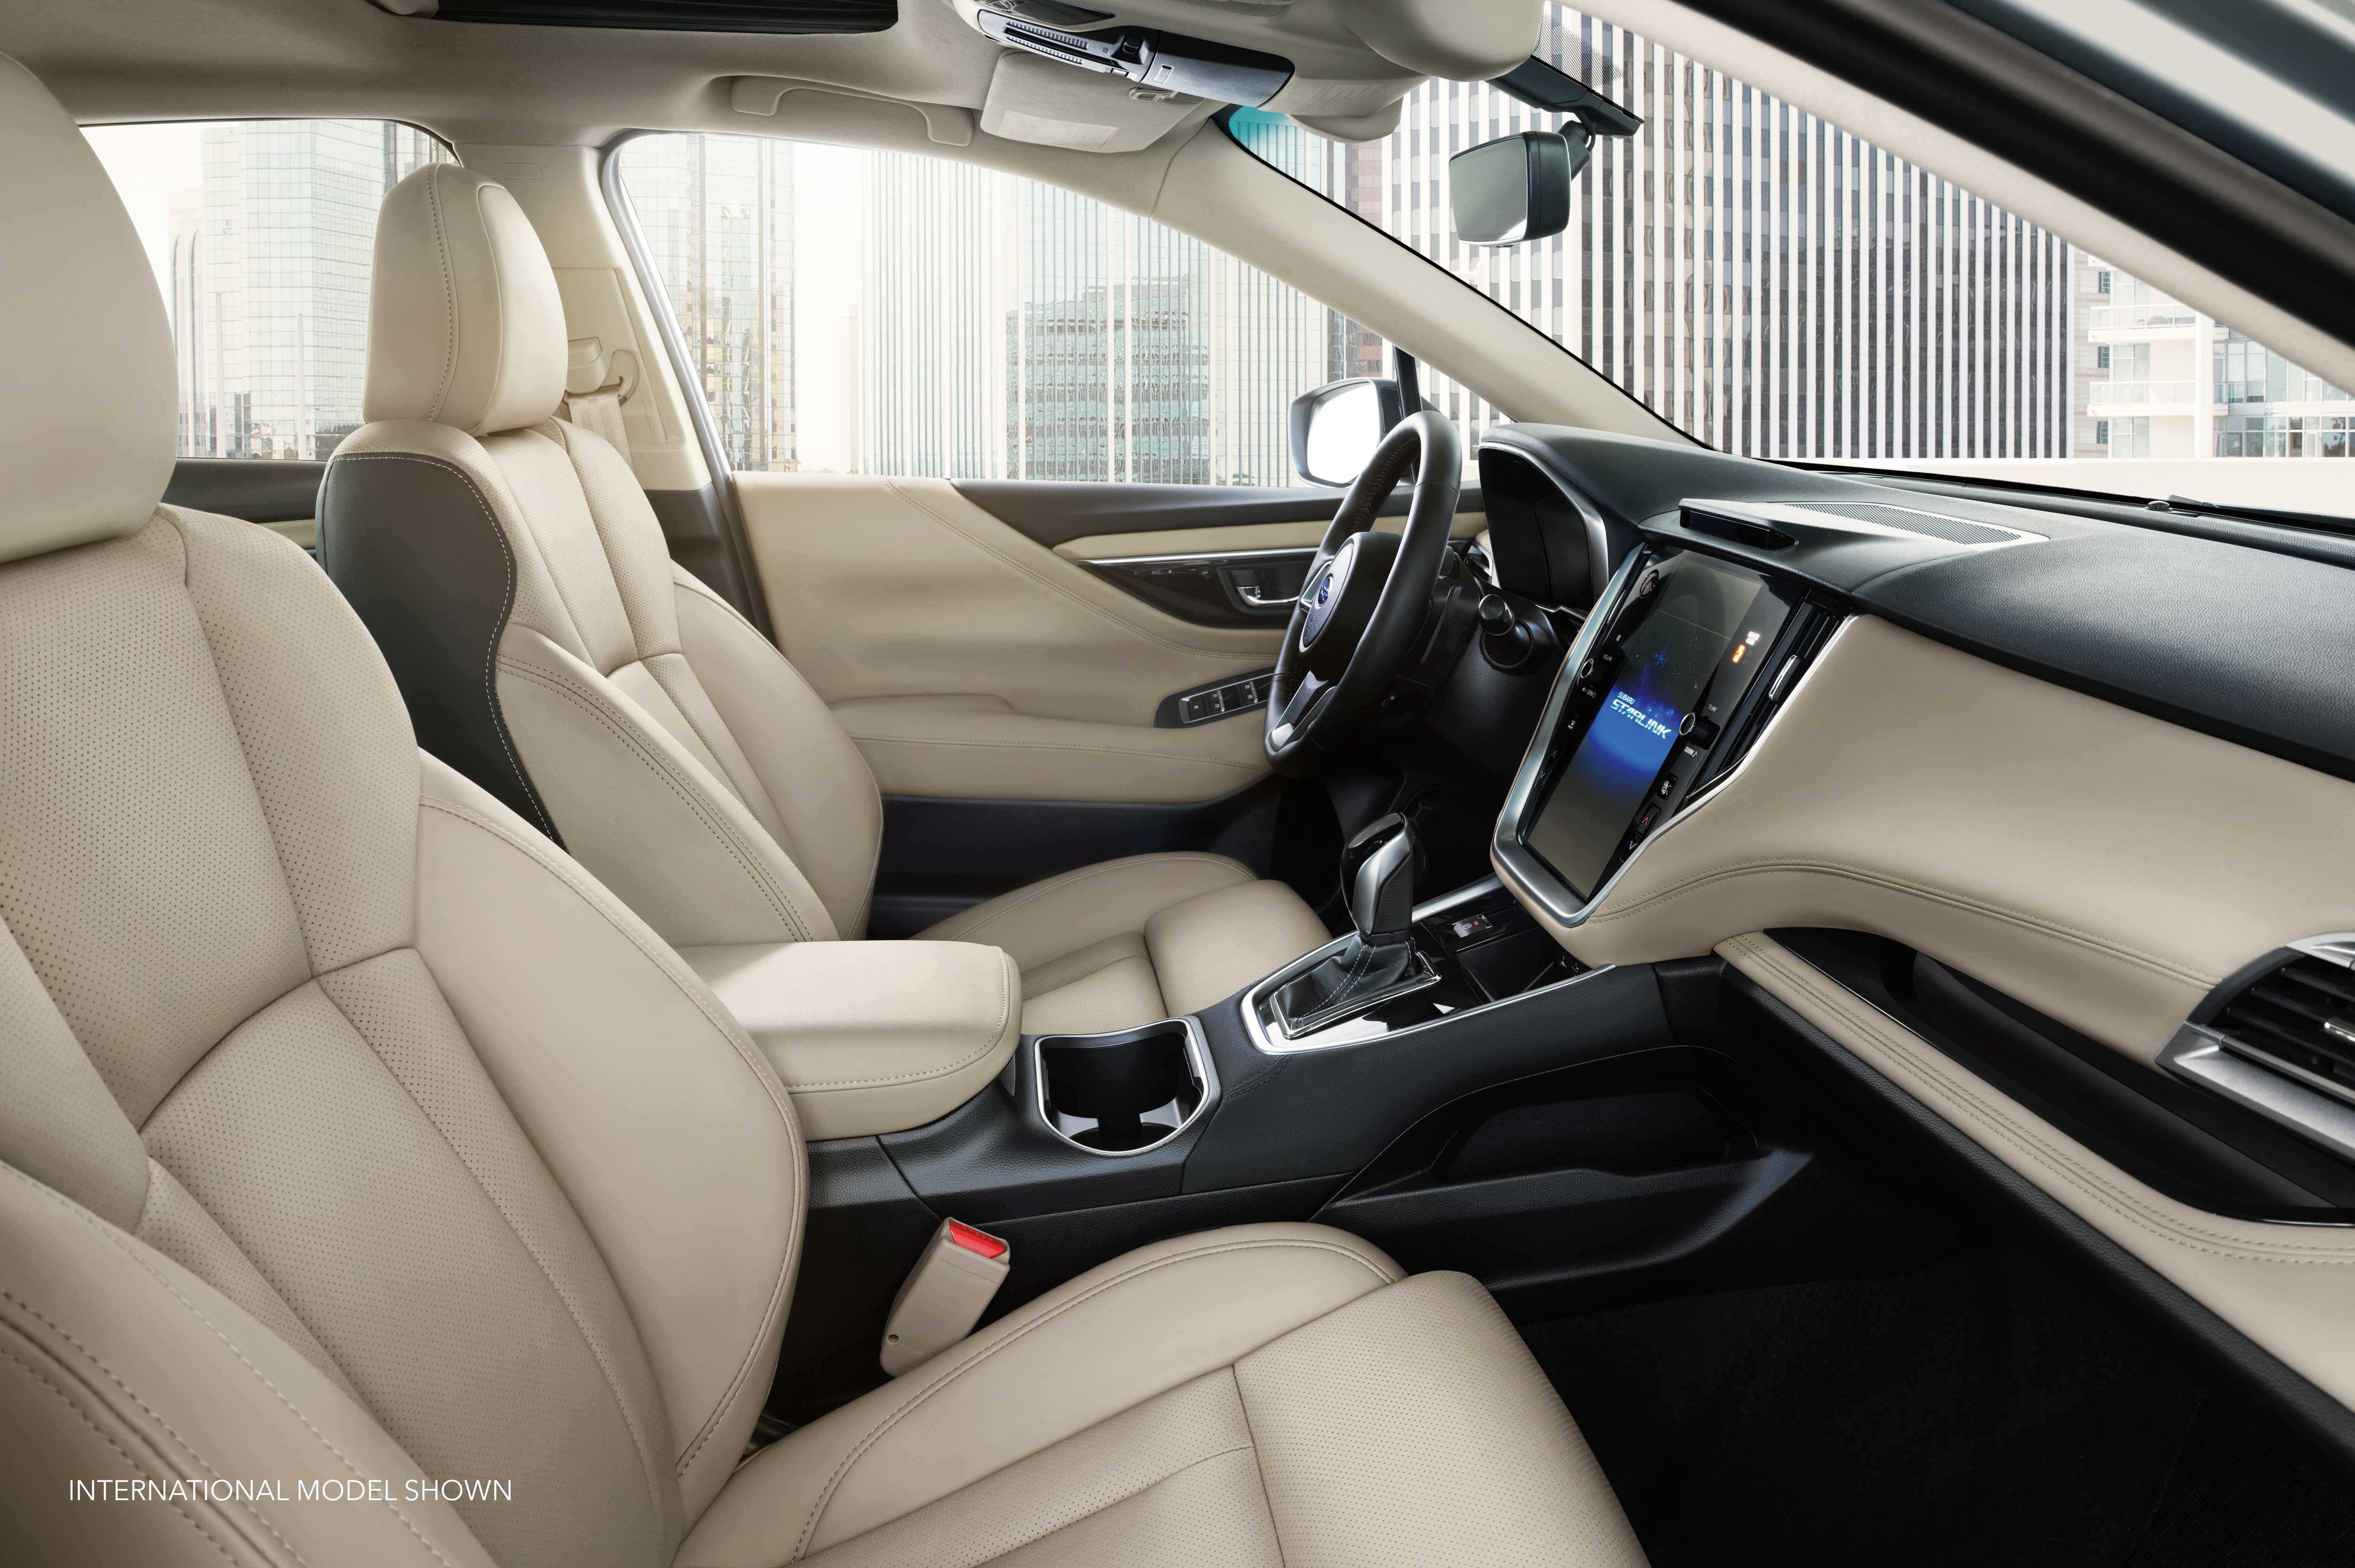 30 Gallery of 2020 Subaru Legacy Price Wallpaper for 2020 Subaru Legacy Price